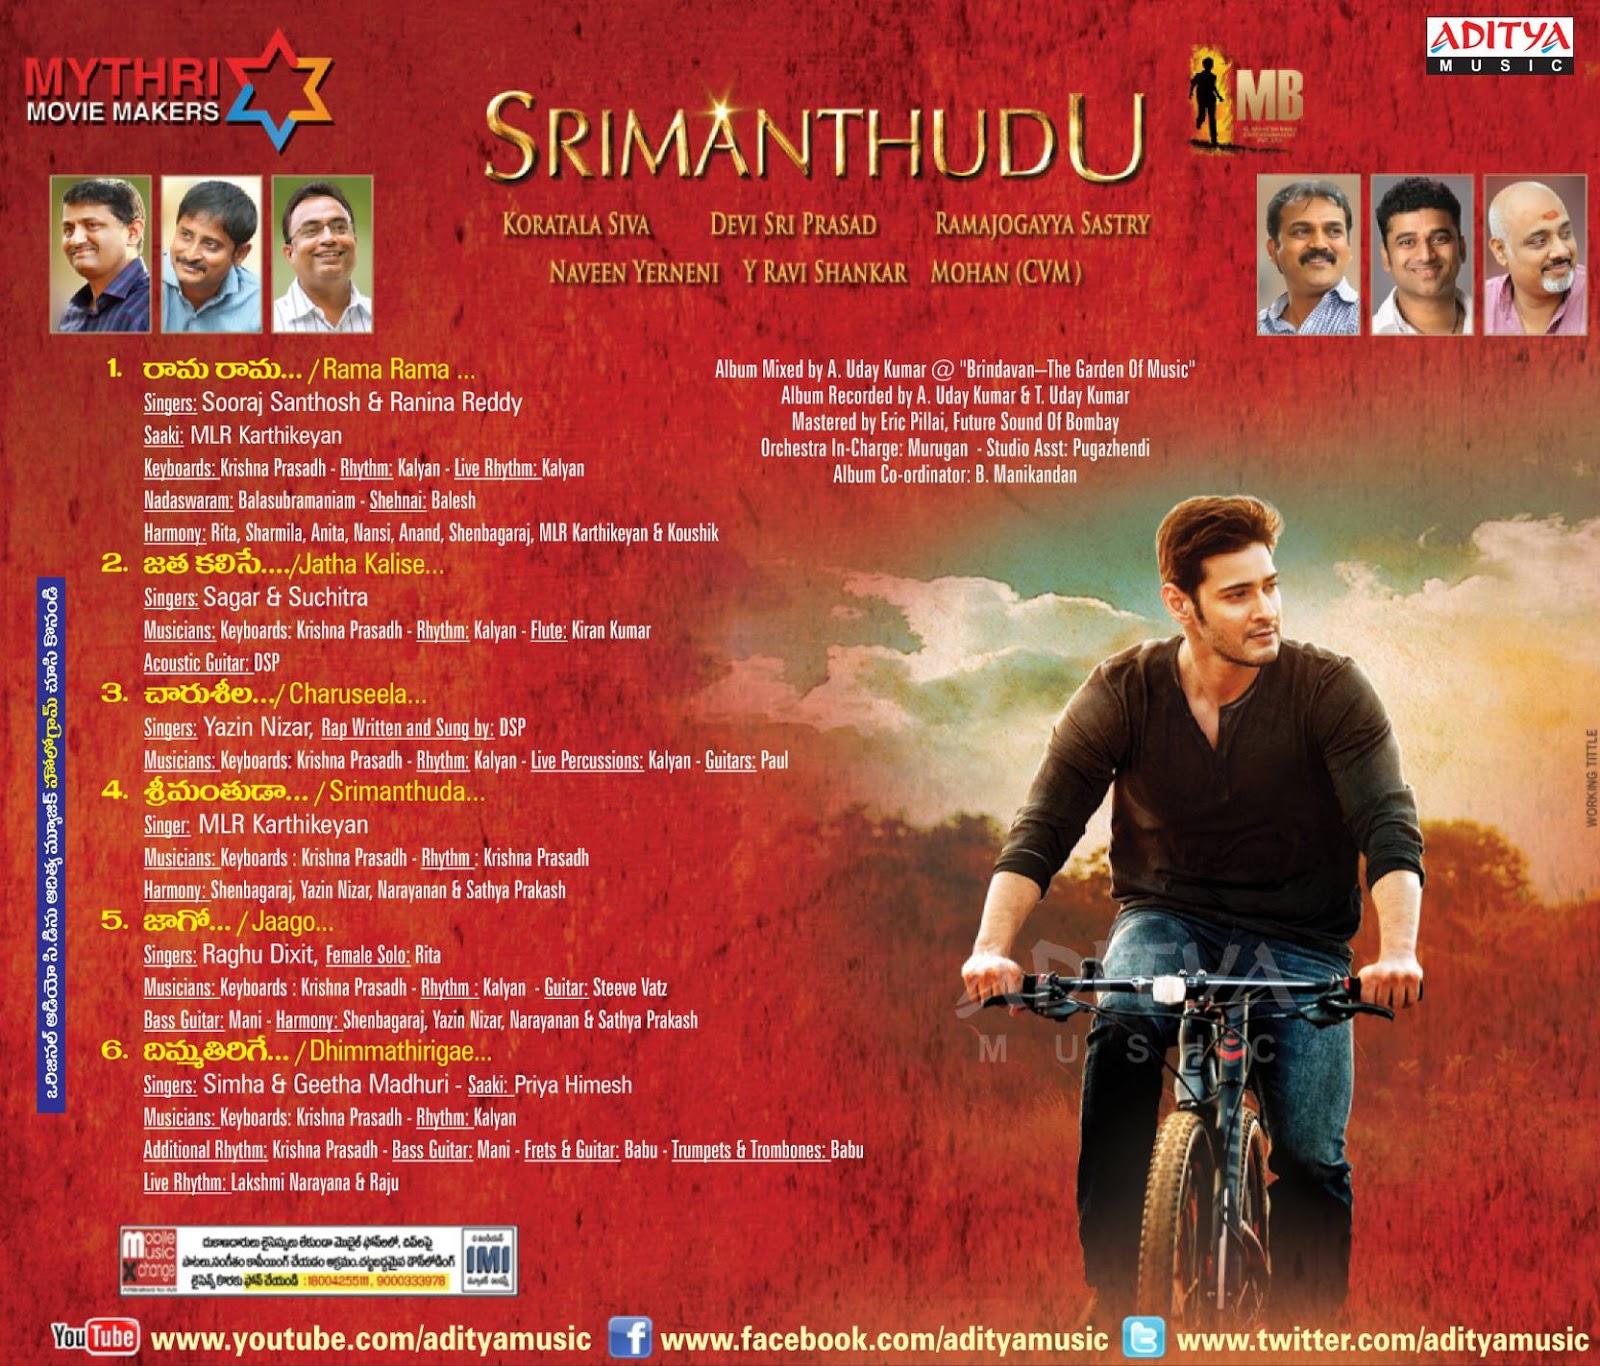 Srimanthudu Audio Track List | Mahesh Babu | Sruthi Hassan | Devi Sri Prasad